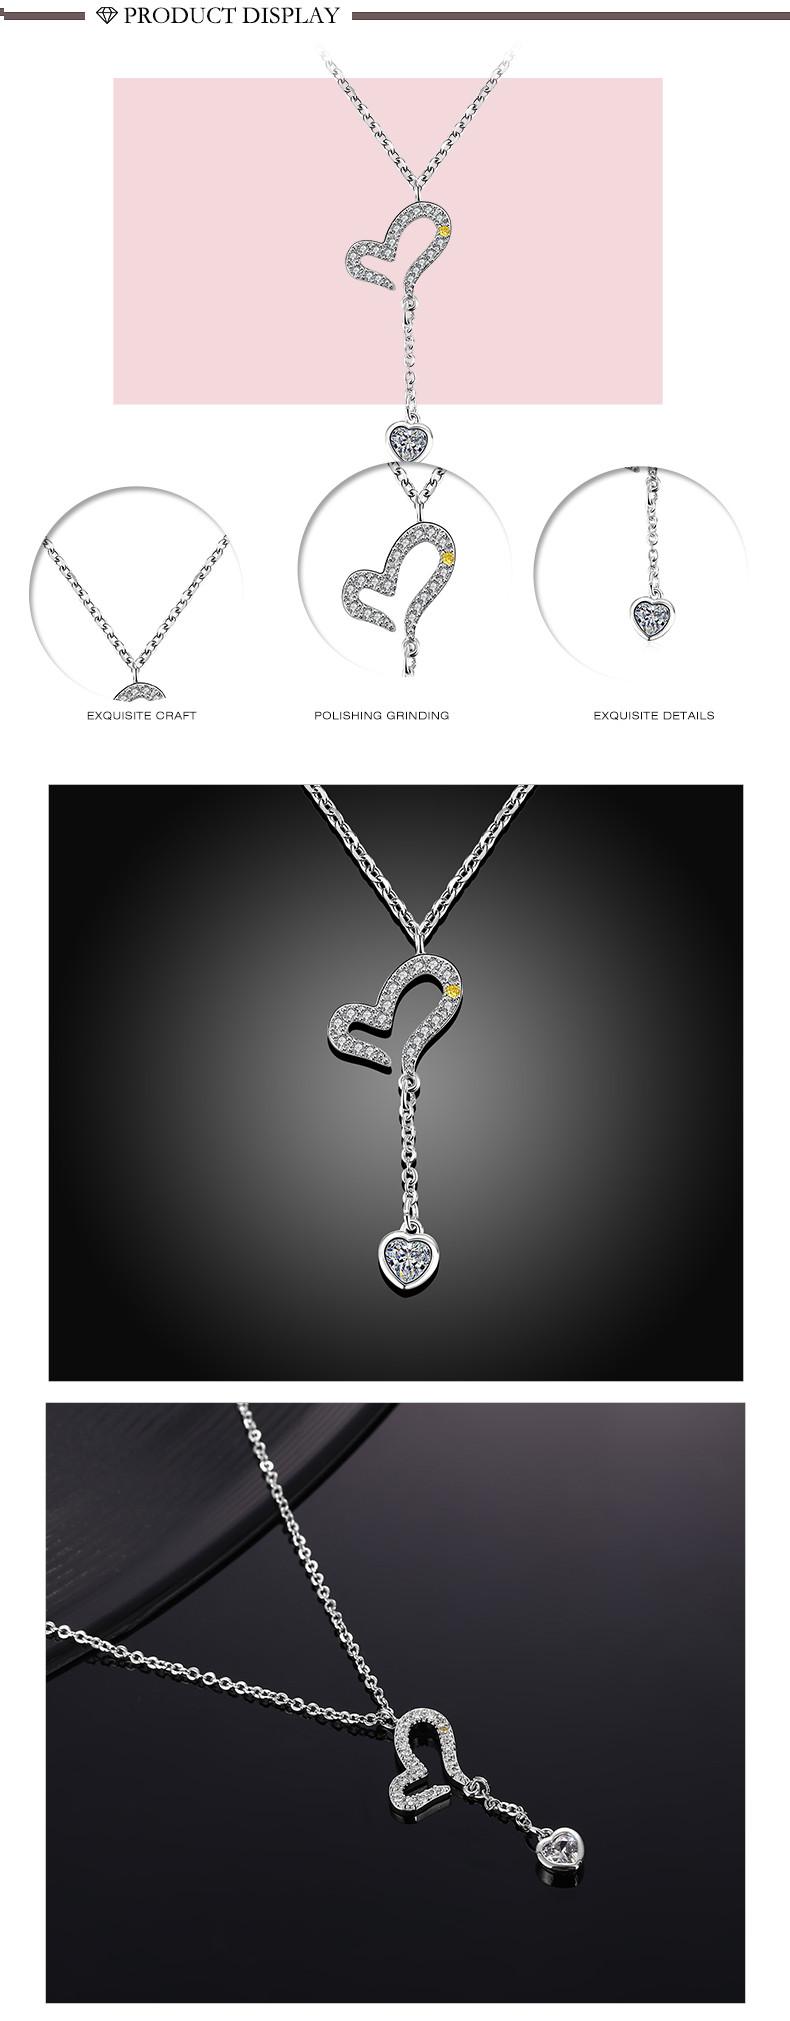 Roxi Merek Kalung Liontin Untuk Wanita Warna Putih Emas Cinta Swiss Navy Jam Tangan Couple Hitam Stainless Steel Sn 8682 Getsubject Aeproduct